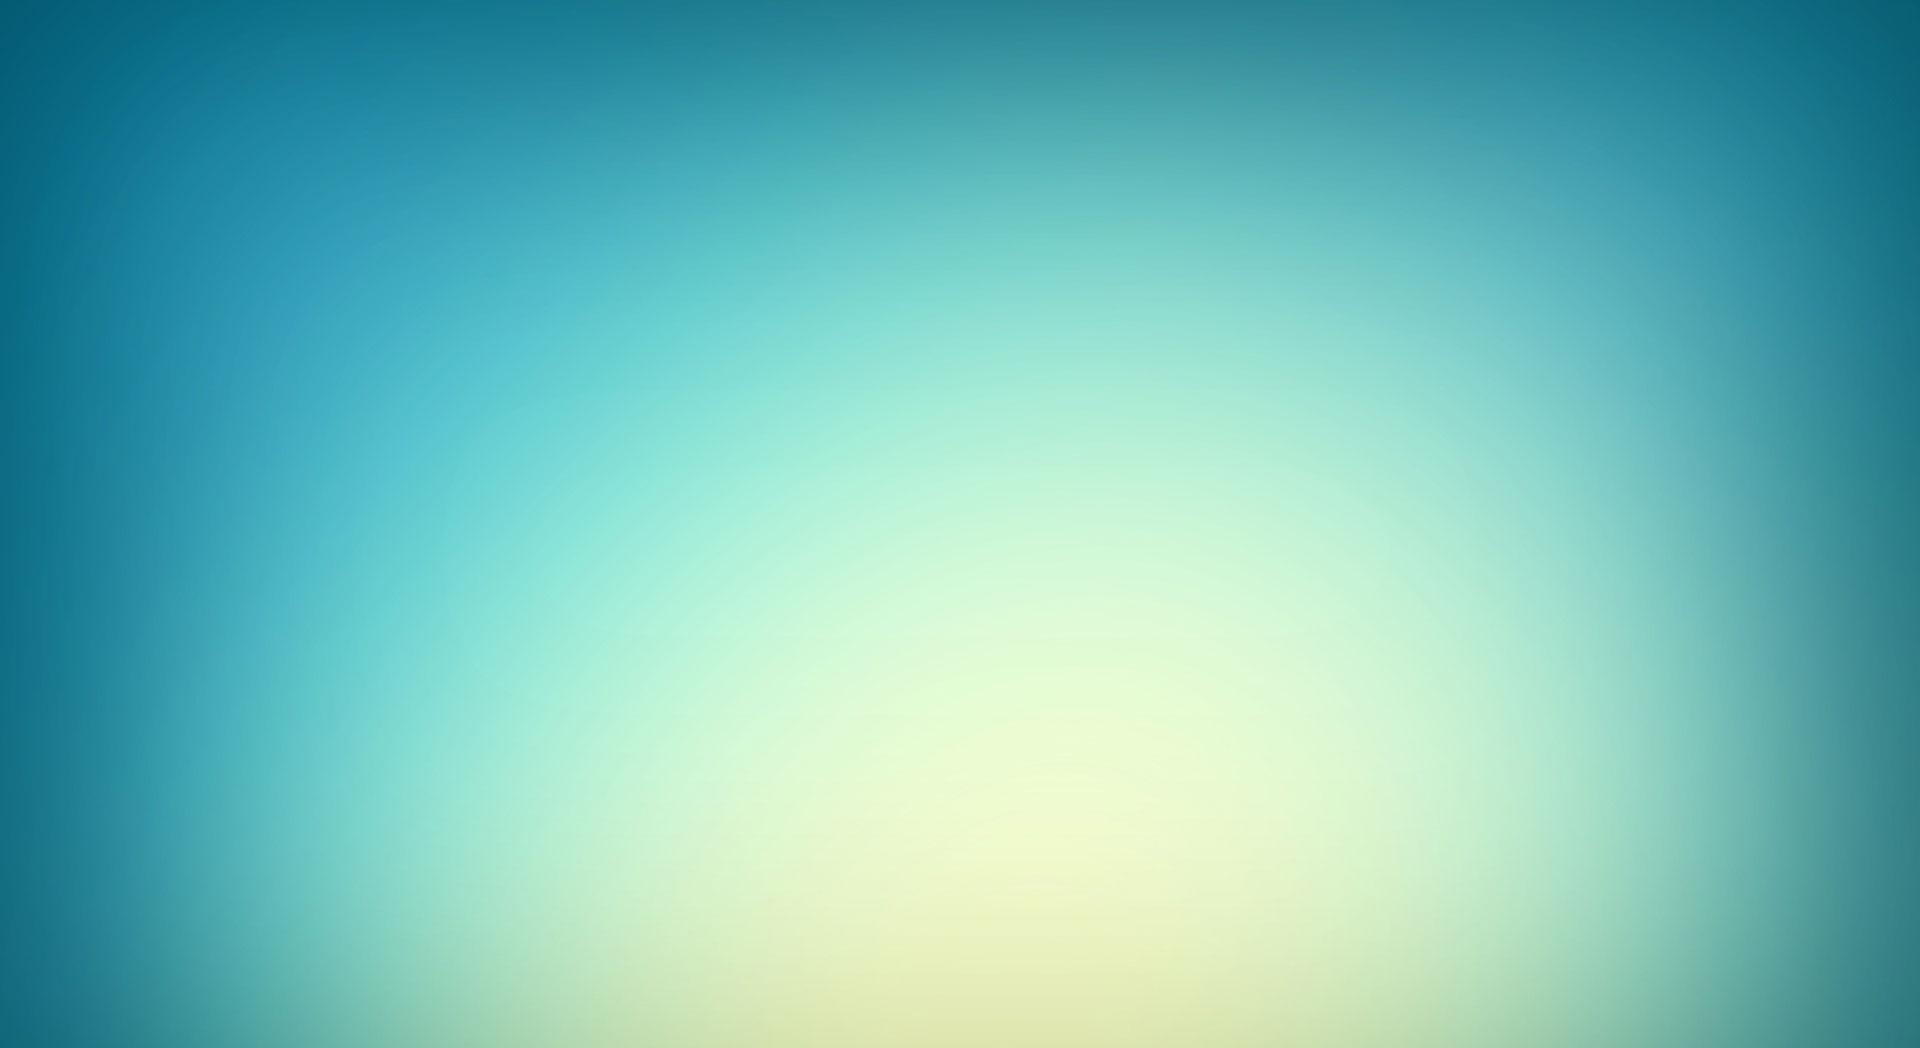 blurry-background-1